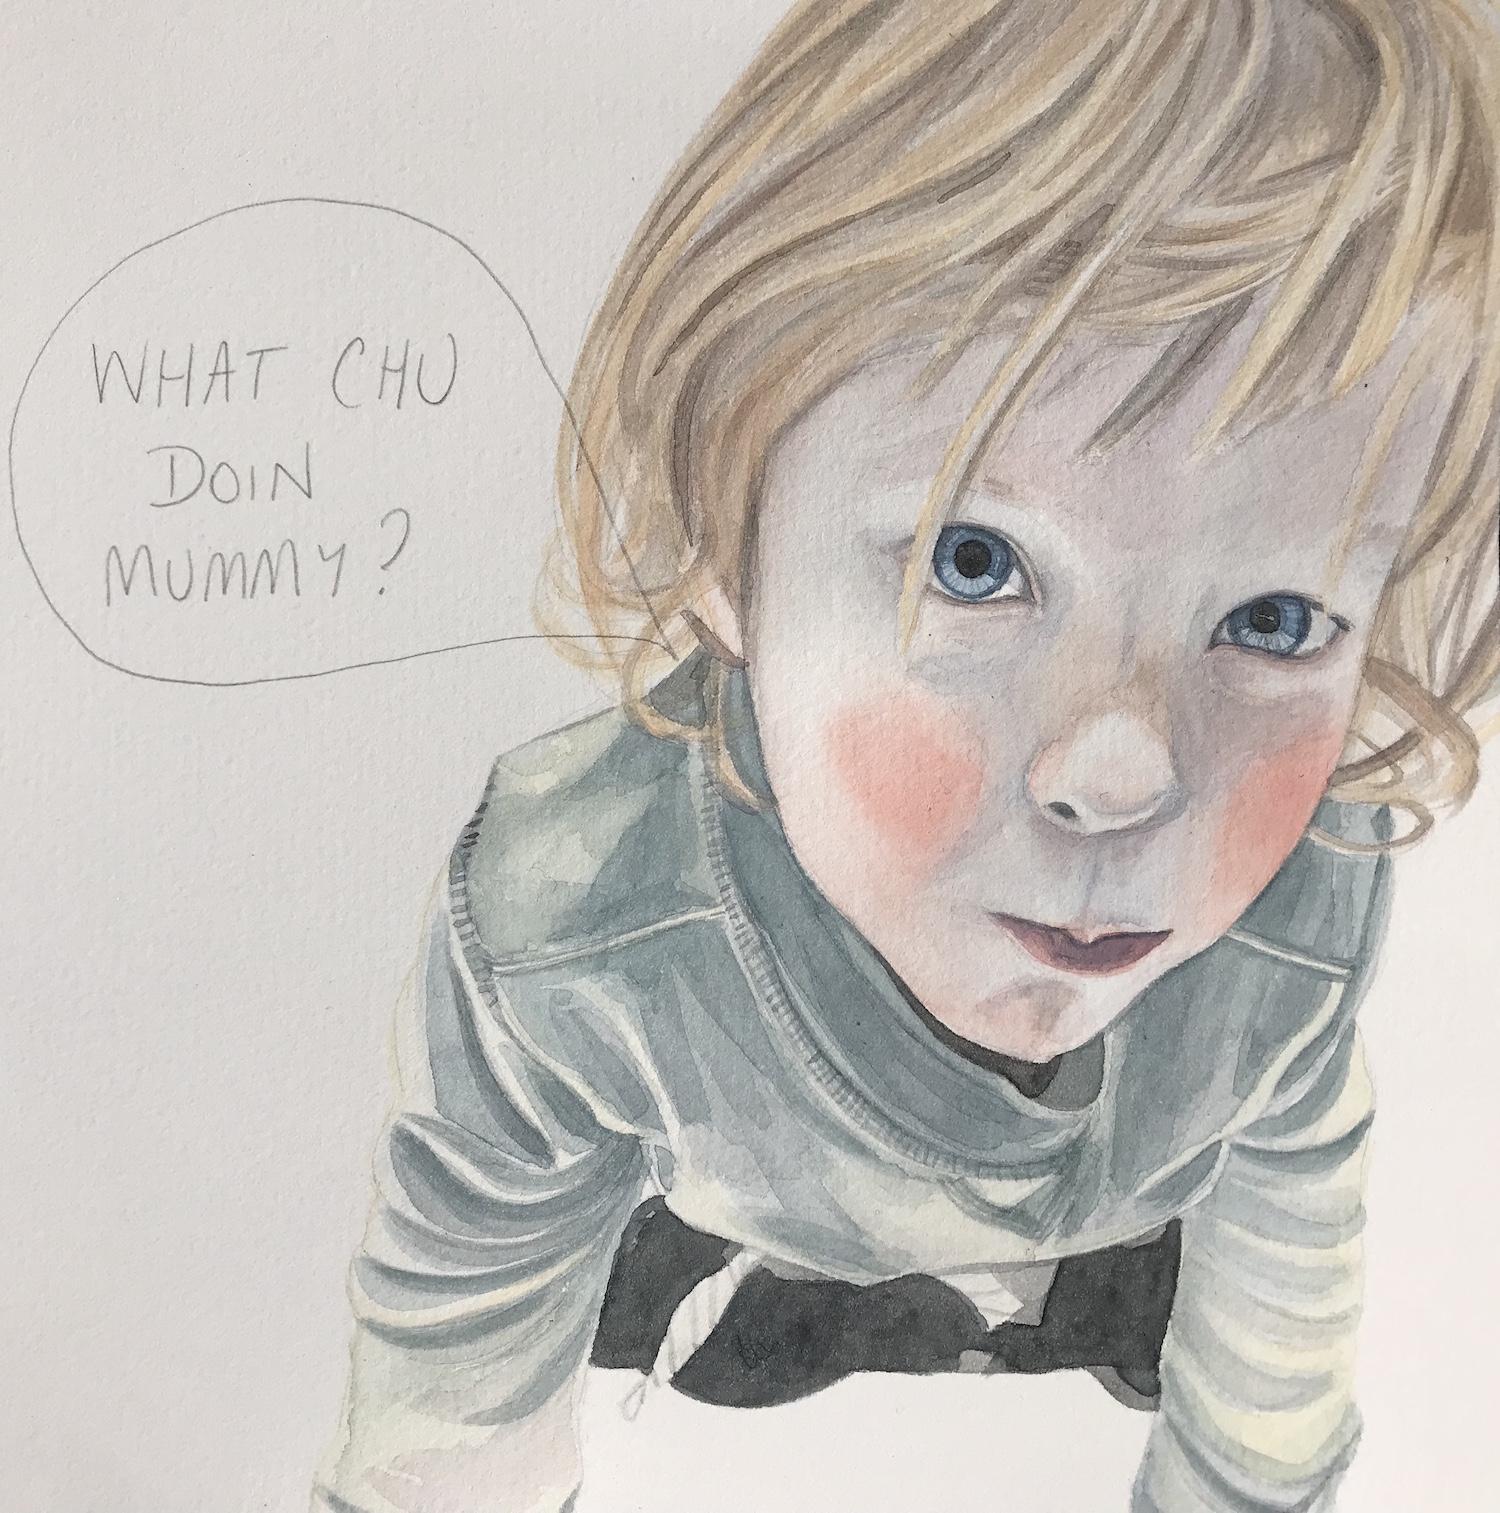 Camille Serisier, Toddlerlife , 2018, 21.0 x 21.0 cm, Image copyright Camille Serisier